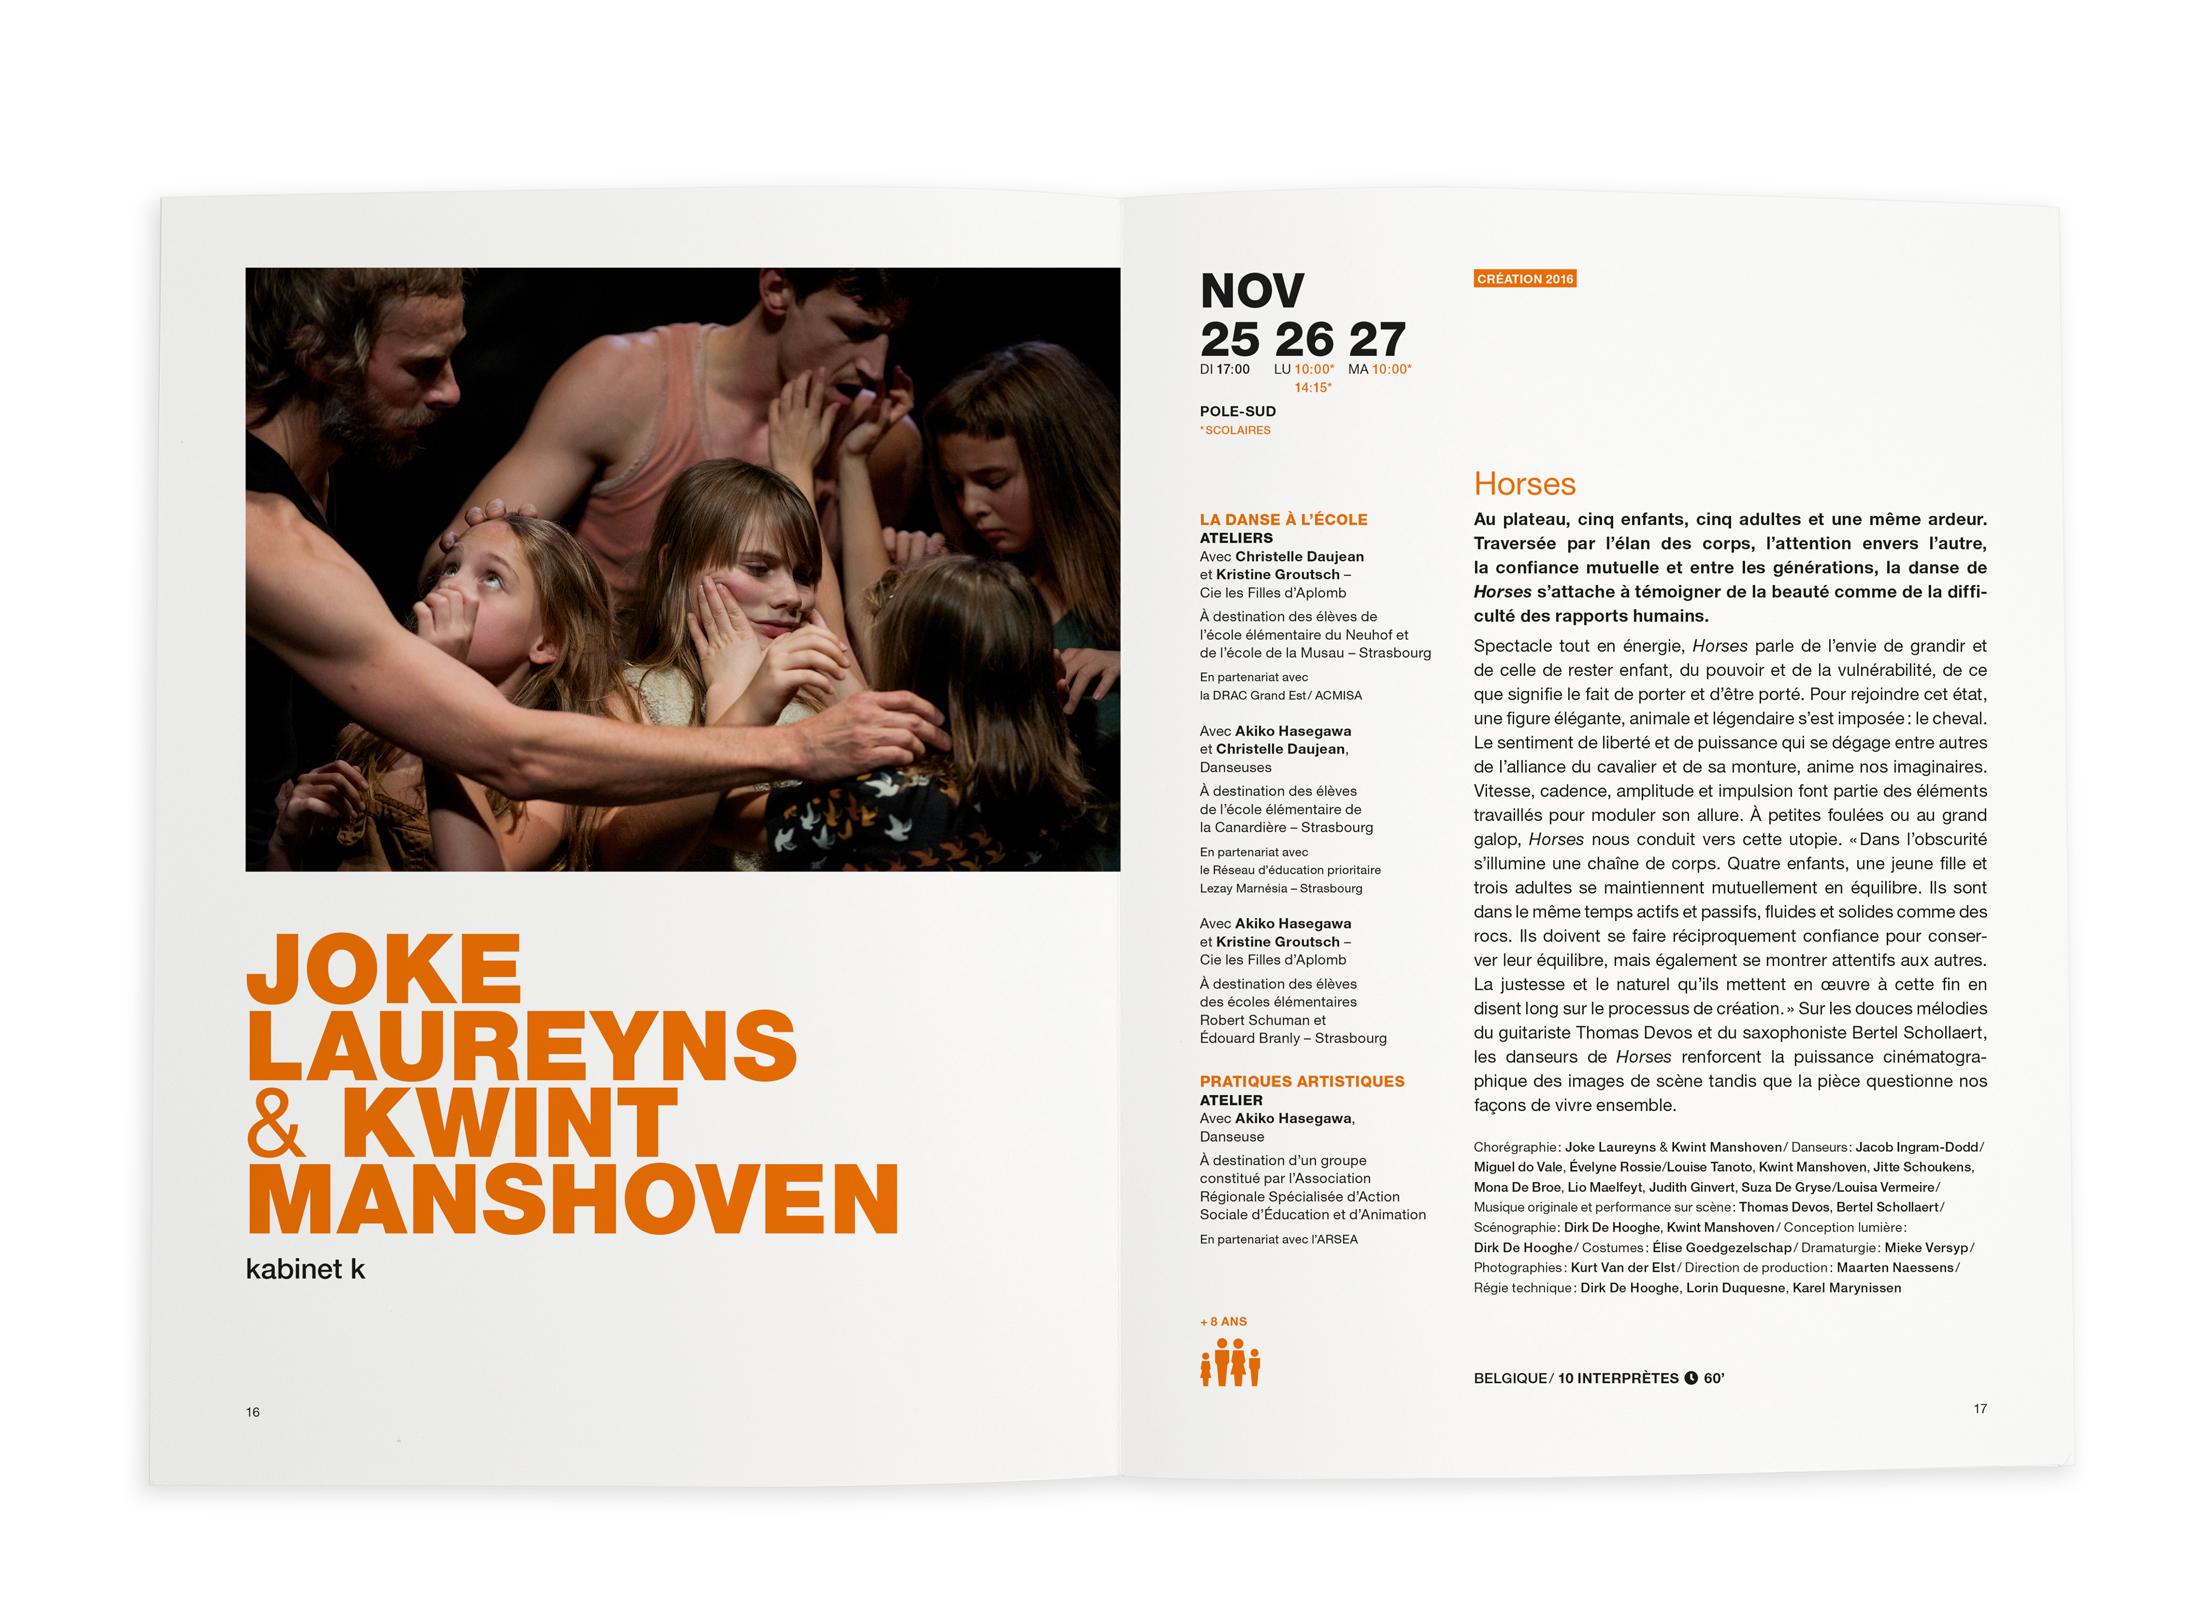 PoleSud Brochure 18 19 09